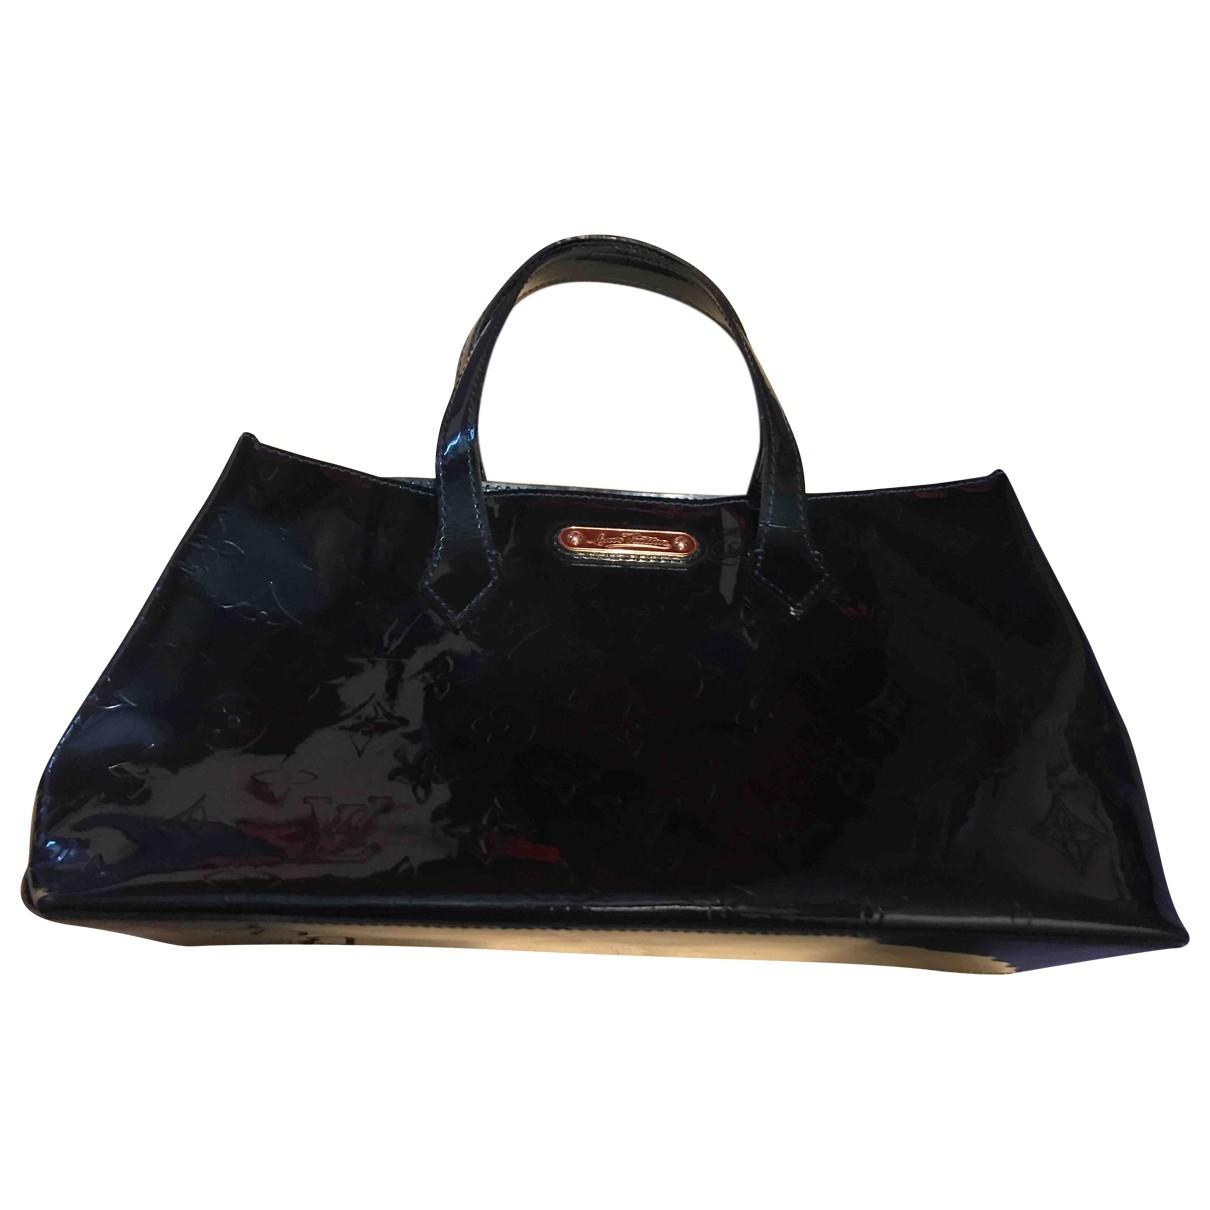 Louis Vuitton \N Green Patent leather handbag for Women \N